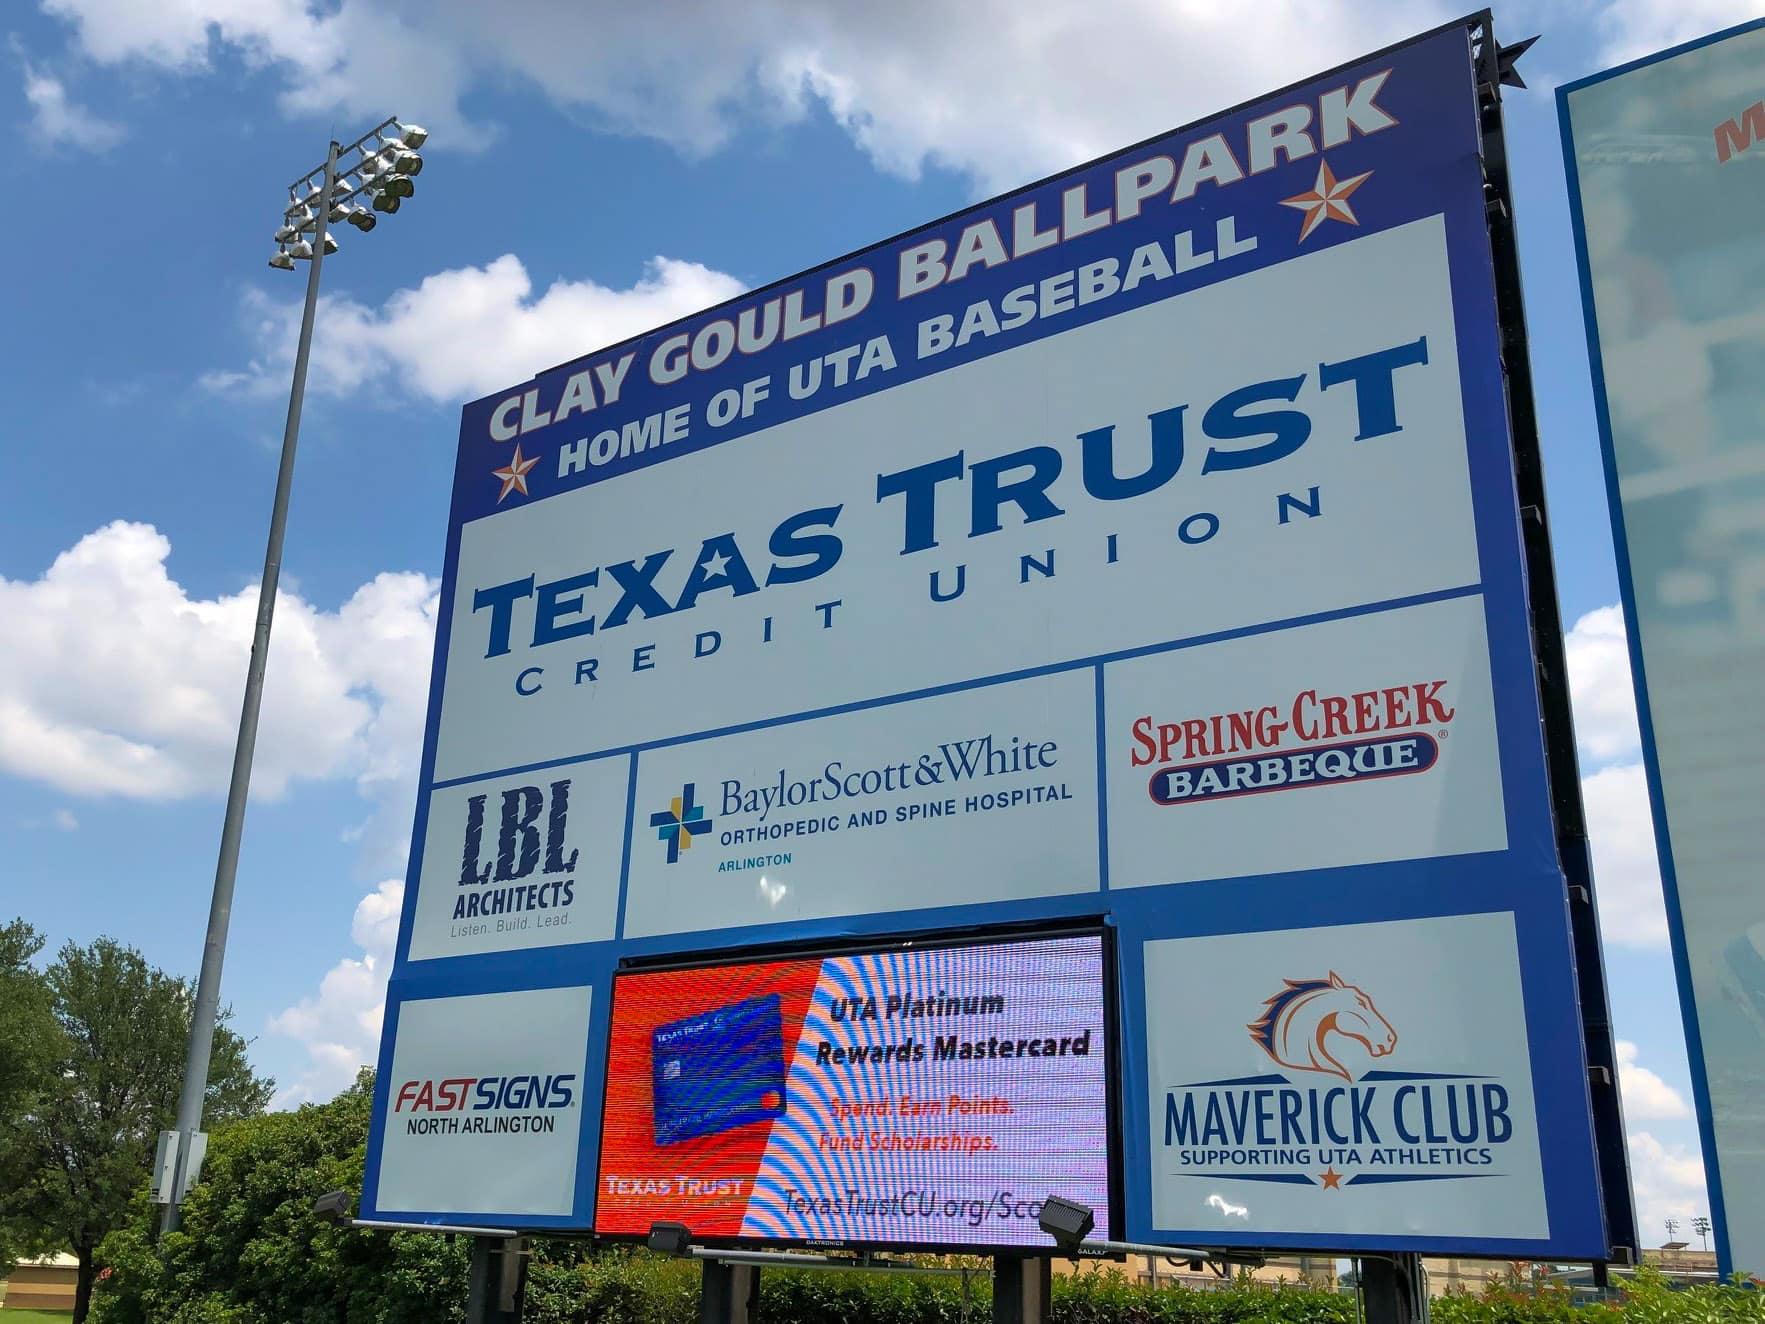 UTA Clay Gould Ballpark sign